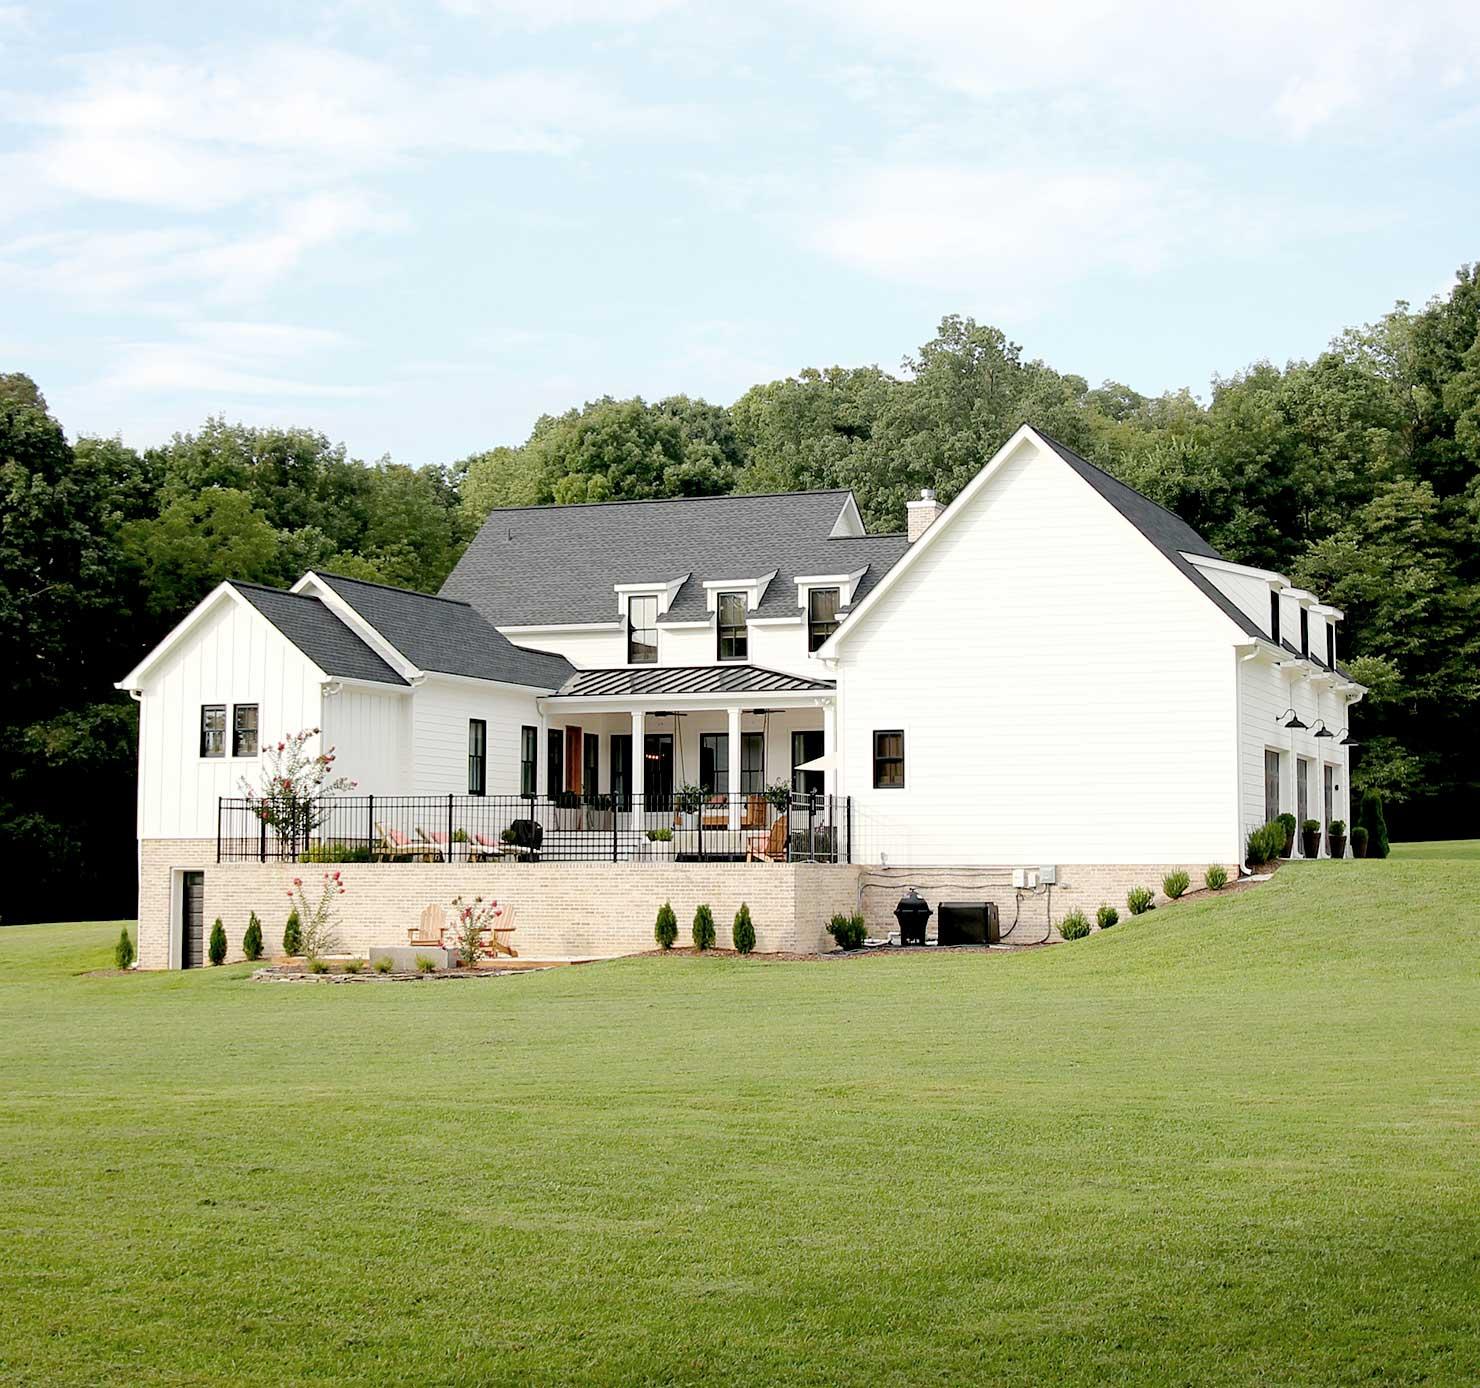 Our Modern Farmhouse: Exterior